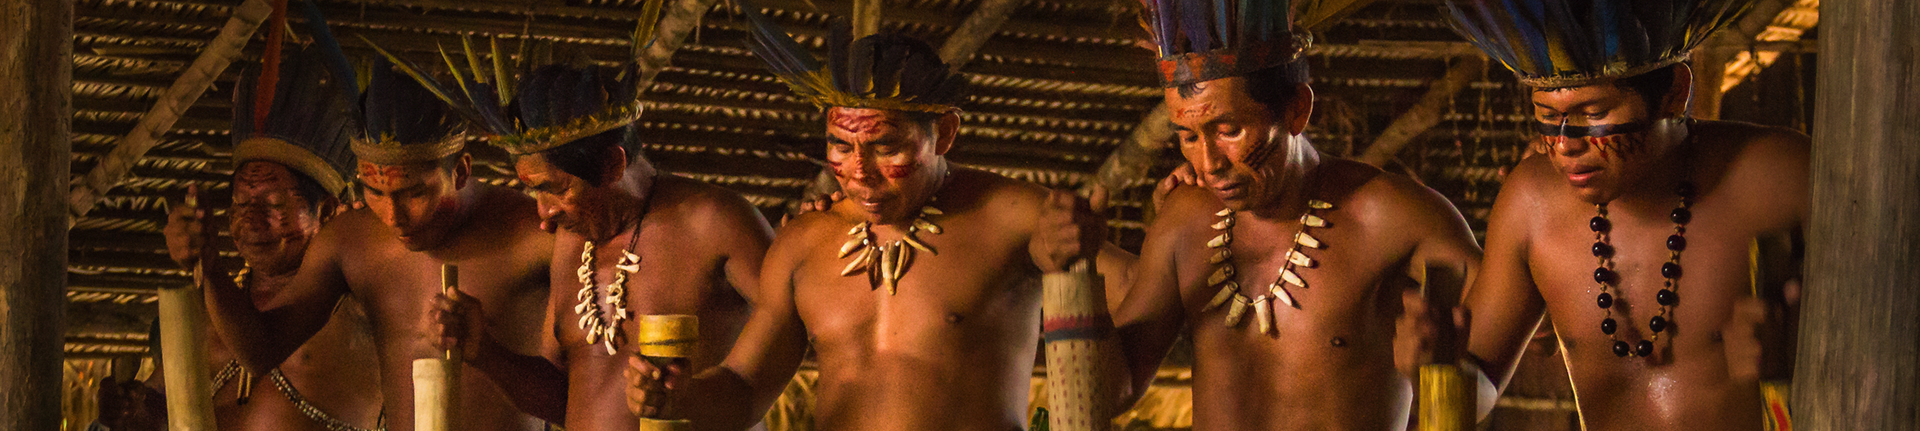 Aldeias indígenas no Brasil para conhecer